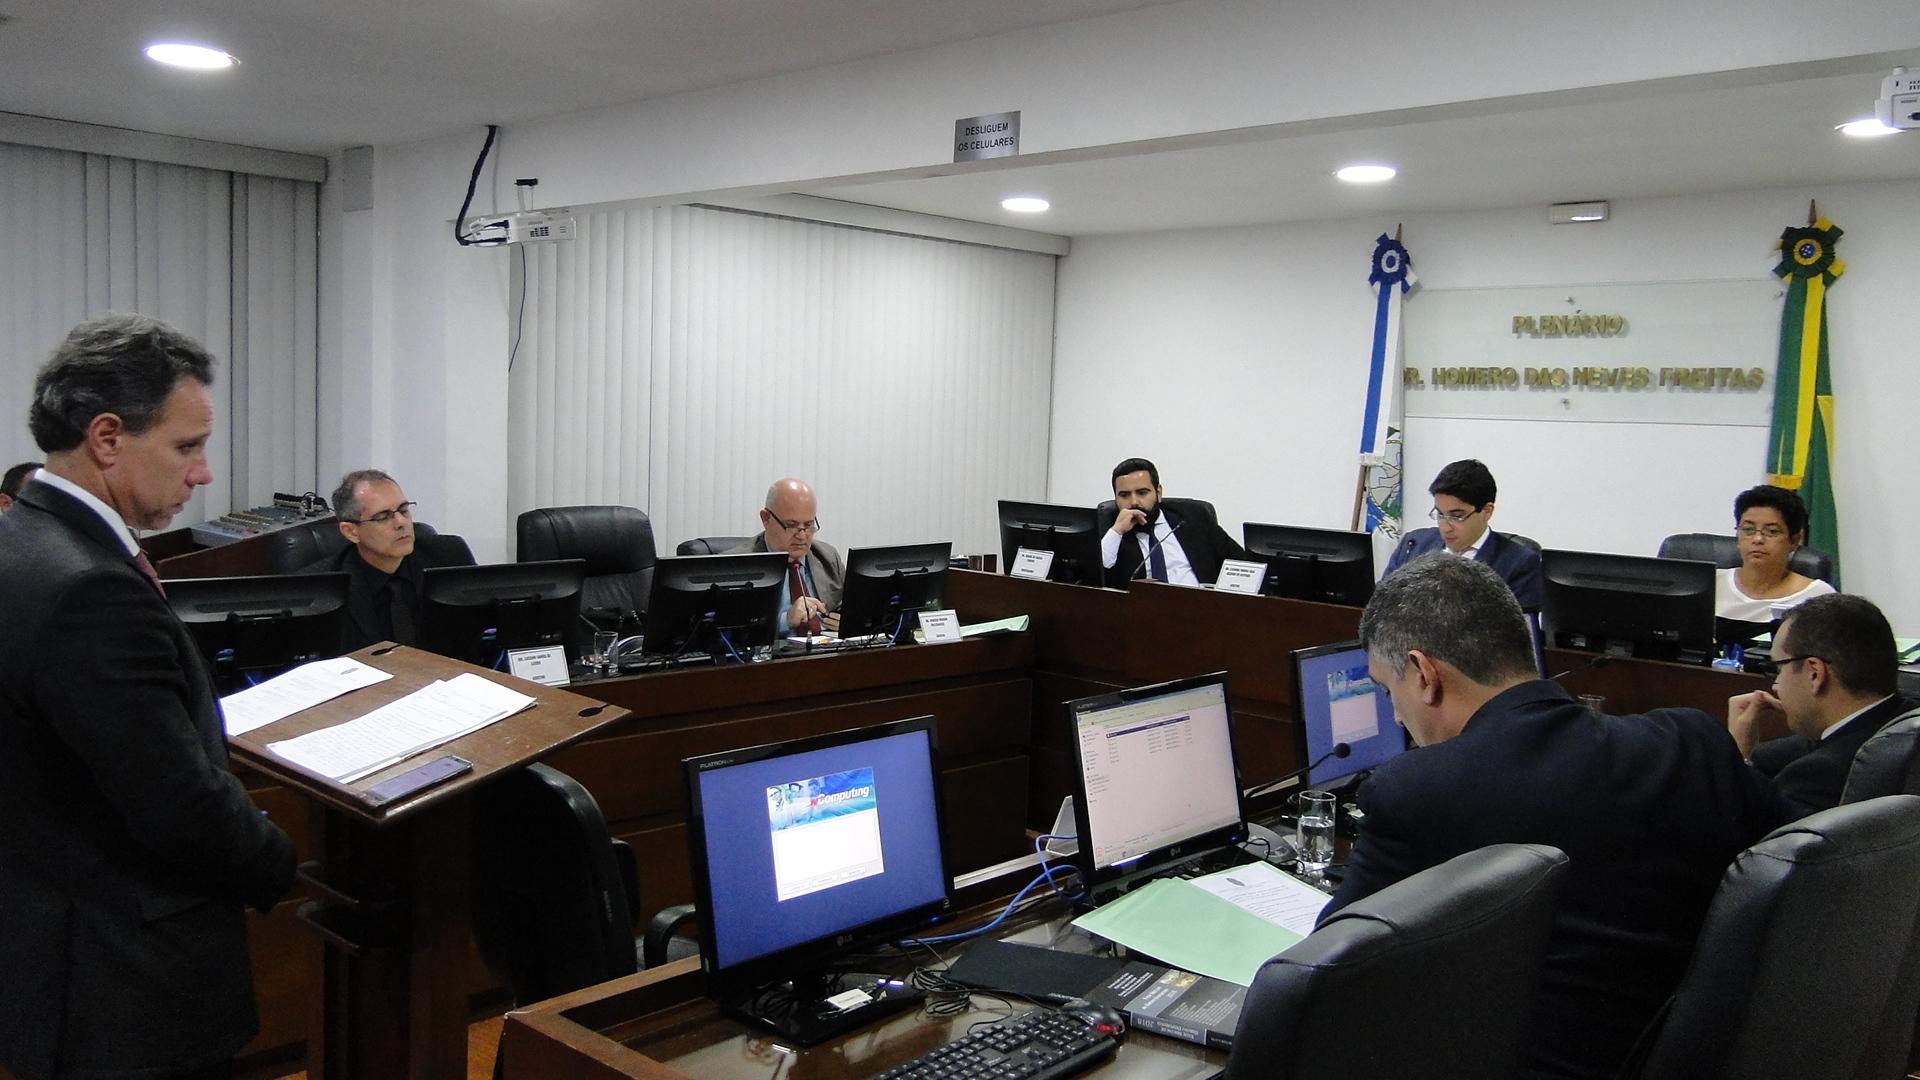 Comissão julga agressões físicas